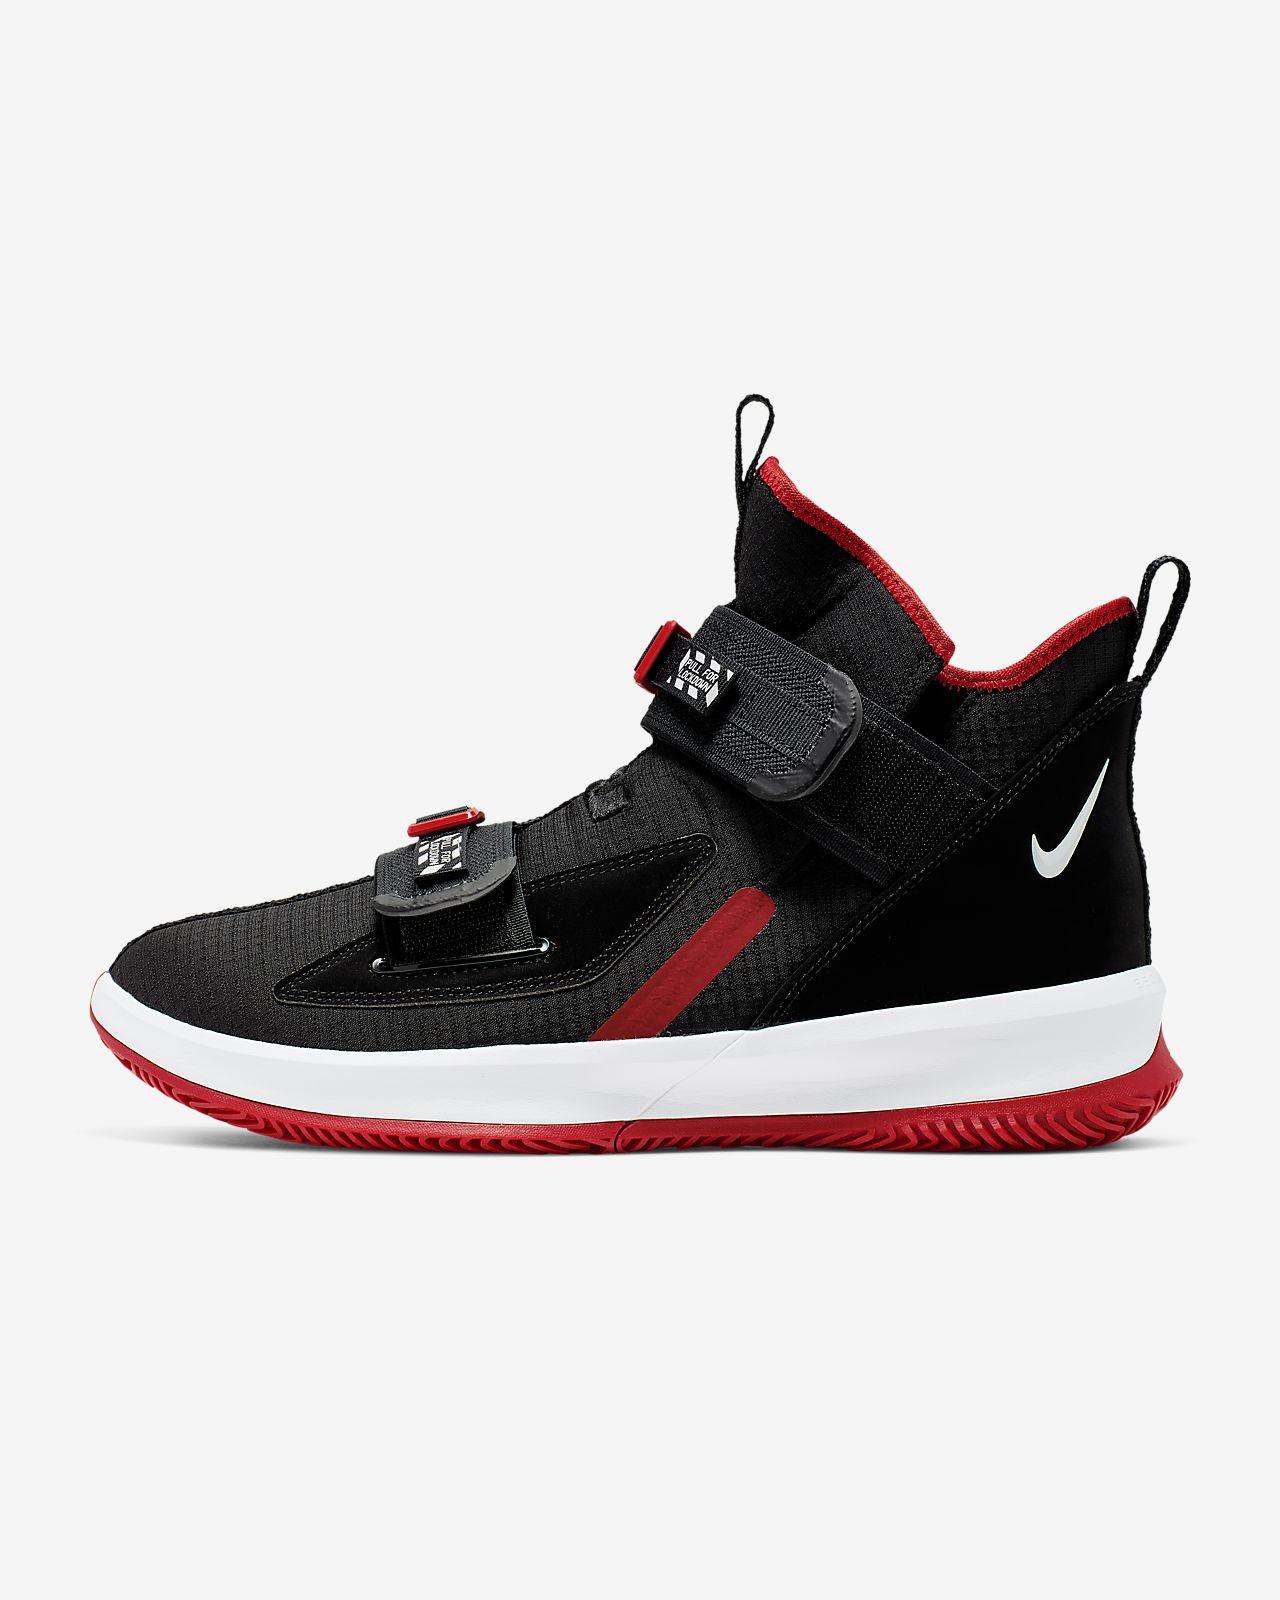 LeBron Soldier XIII SFG 籃球鞋